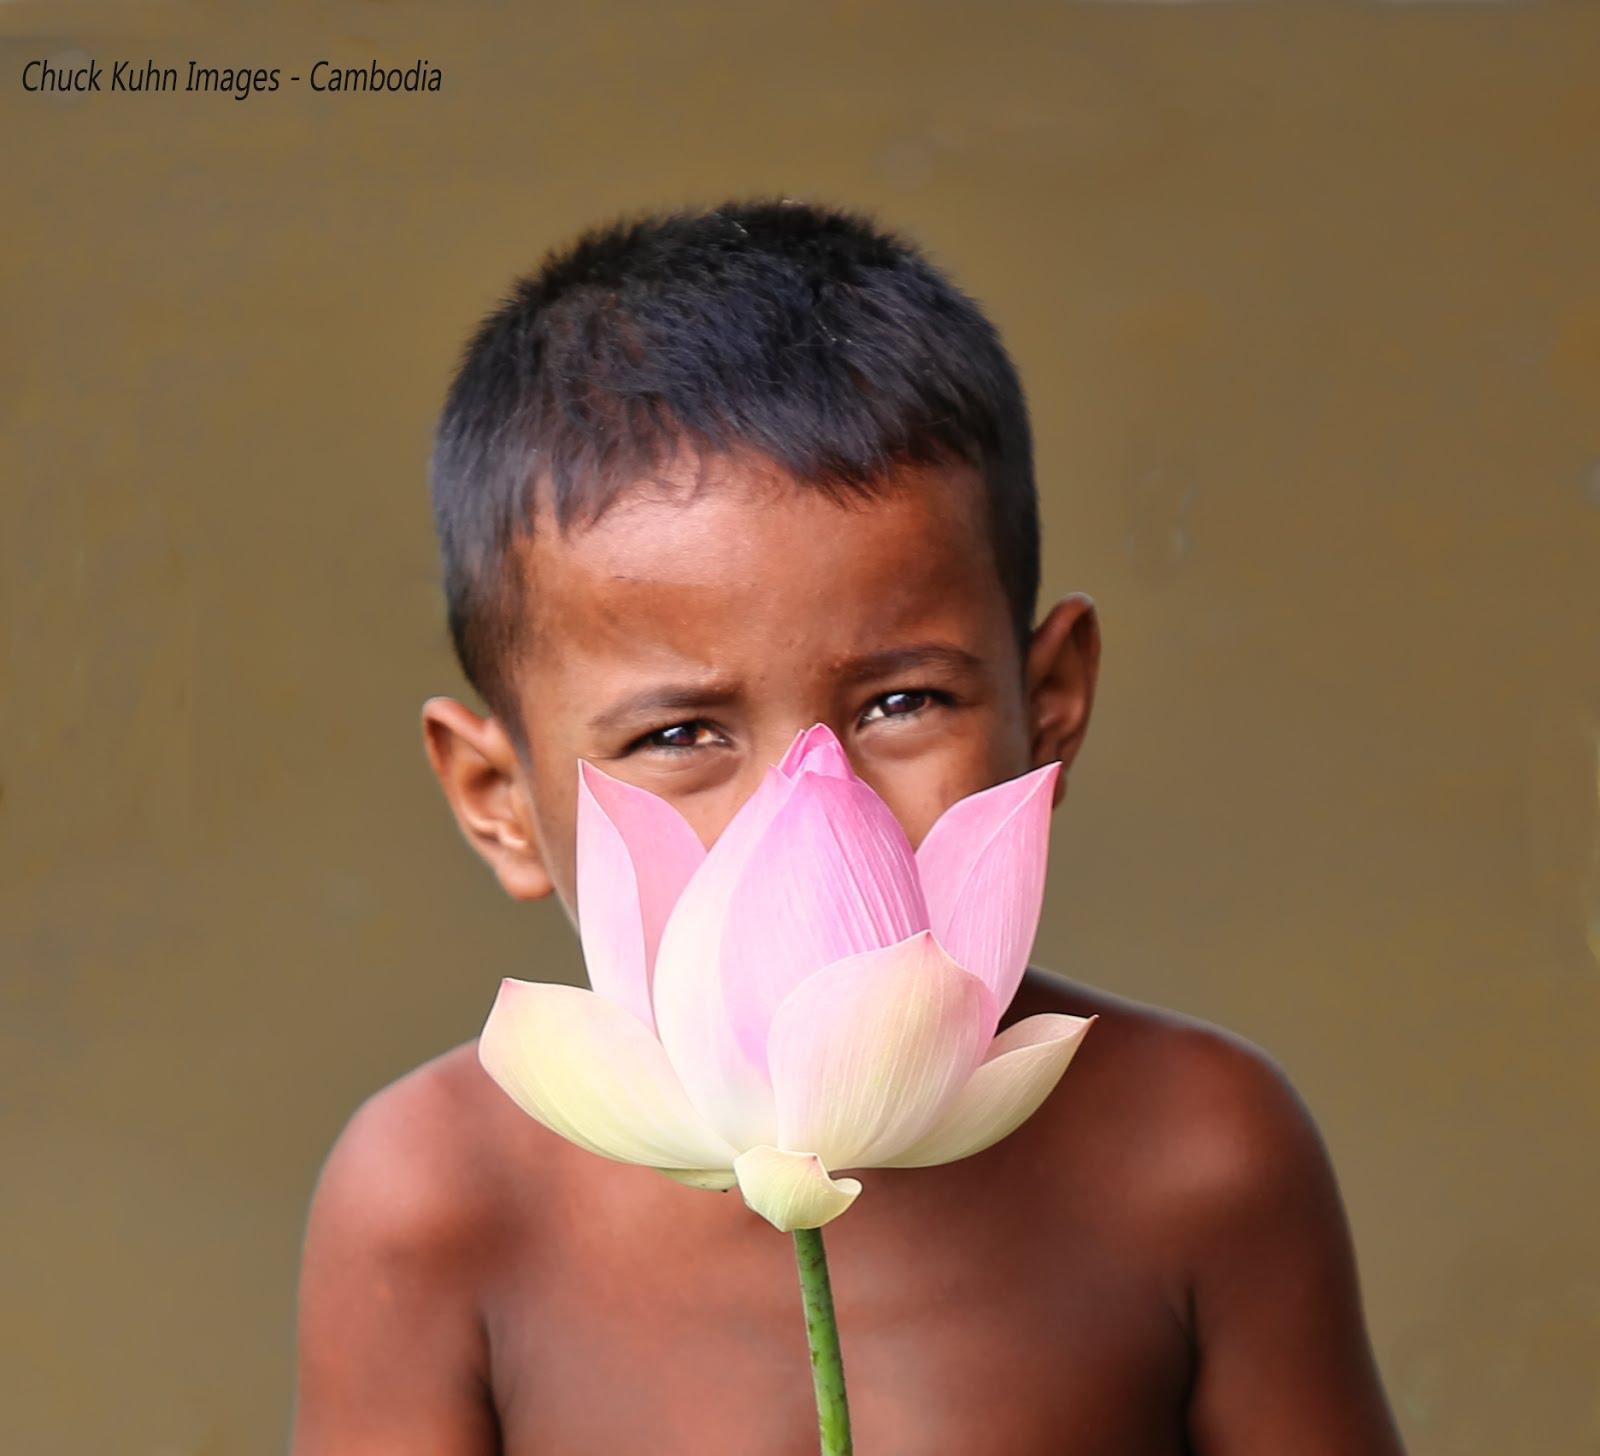 Lotus for me